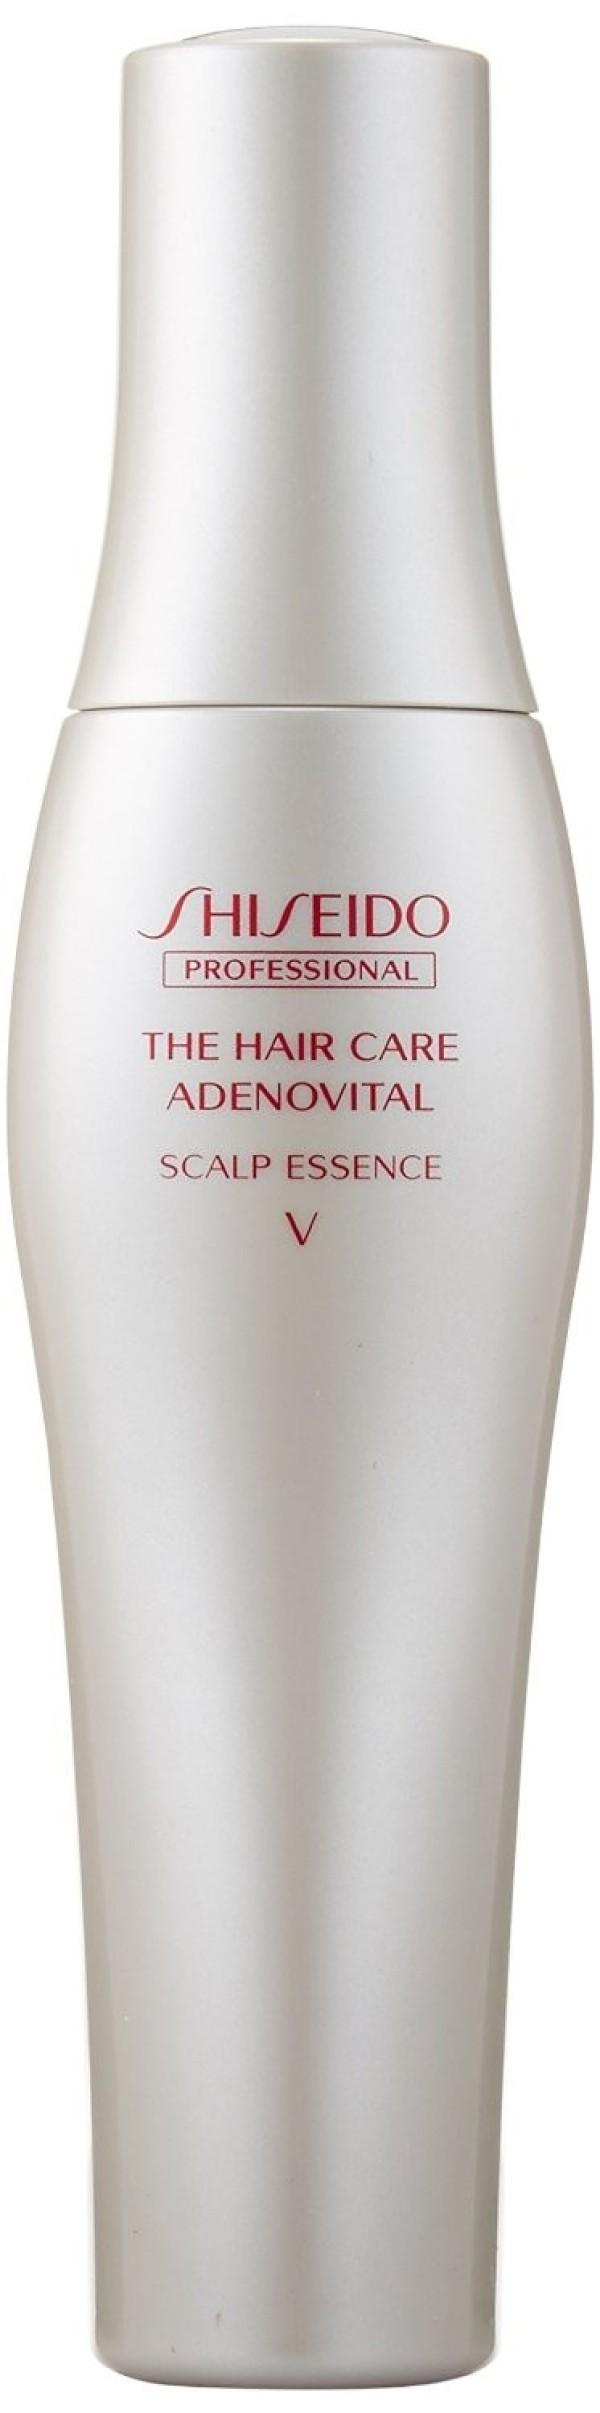 Эссенция - активатор роста волоc Shiseido Adenovital Scalp Essense